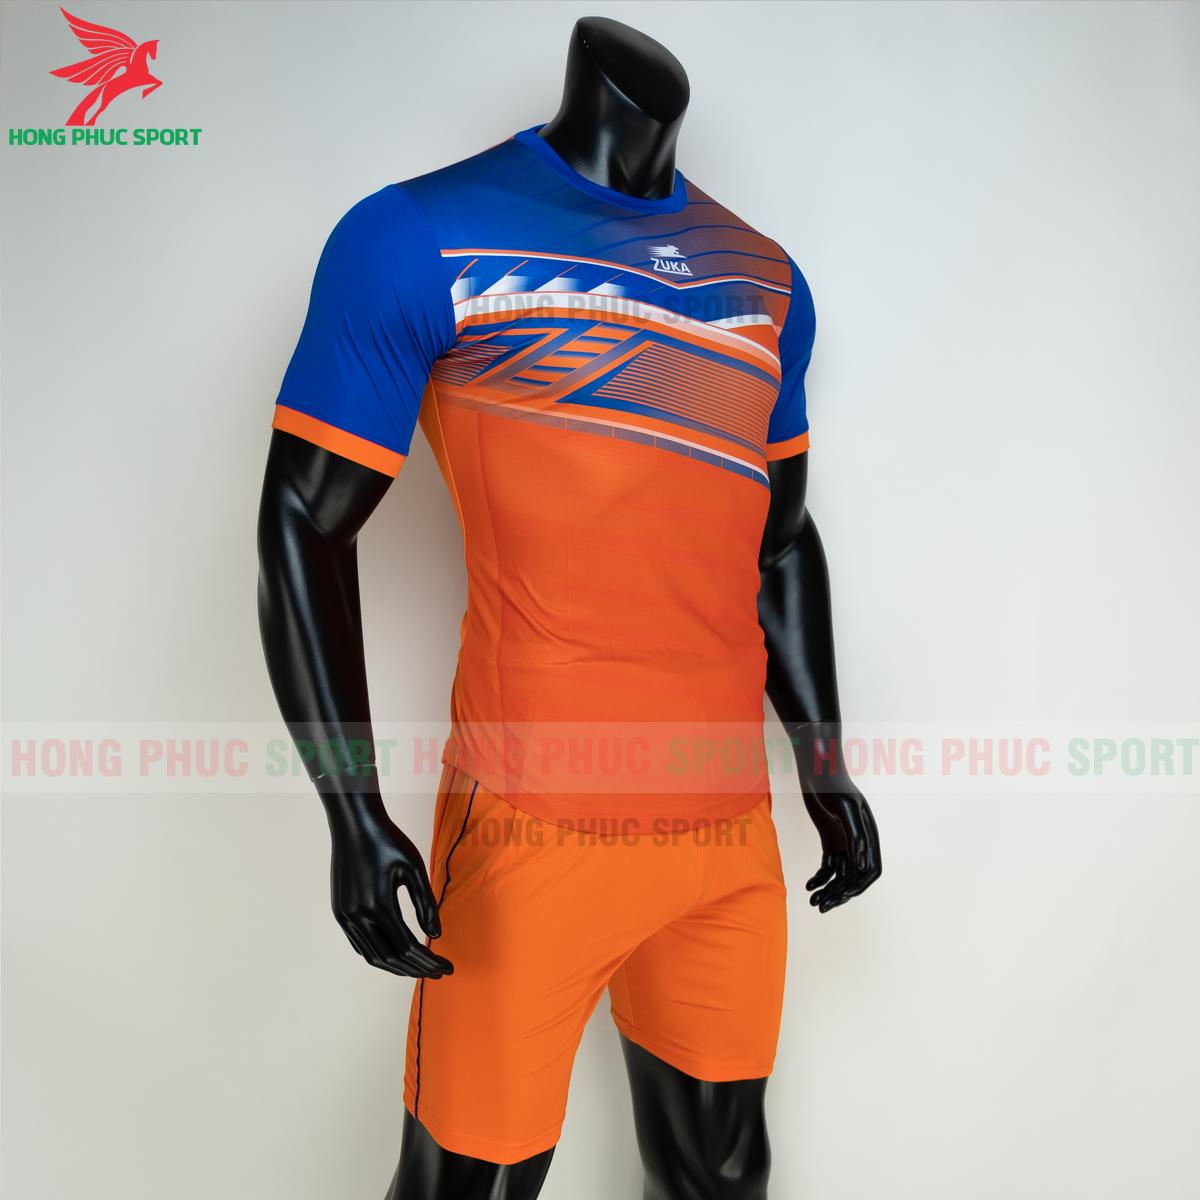 https://cdn.hongphucsport.com/unsafe/s4.shopbay.vn/files/285/ao-bong-da-khong-logo-zuka-01-mau-cam-6-60502bc597980.png